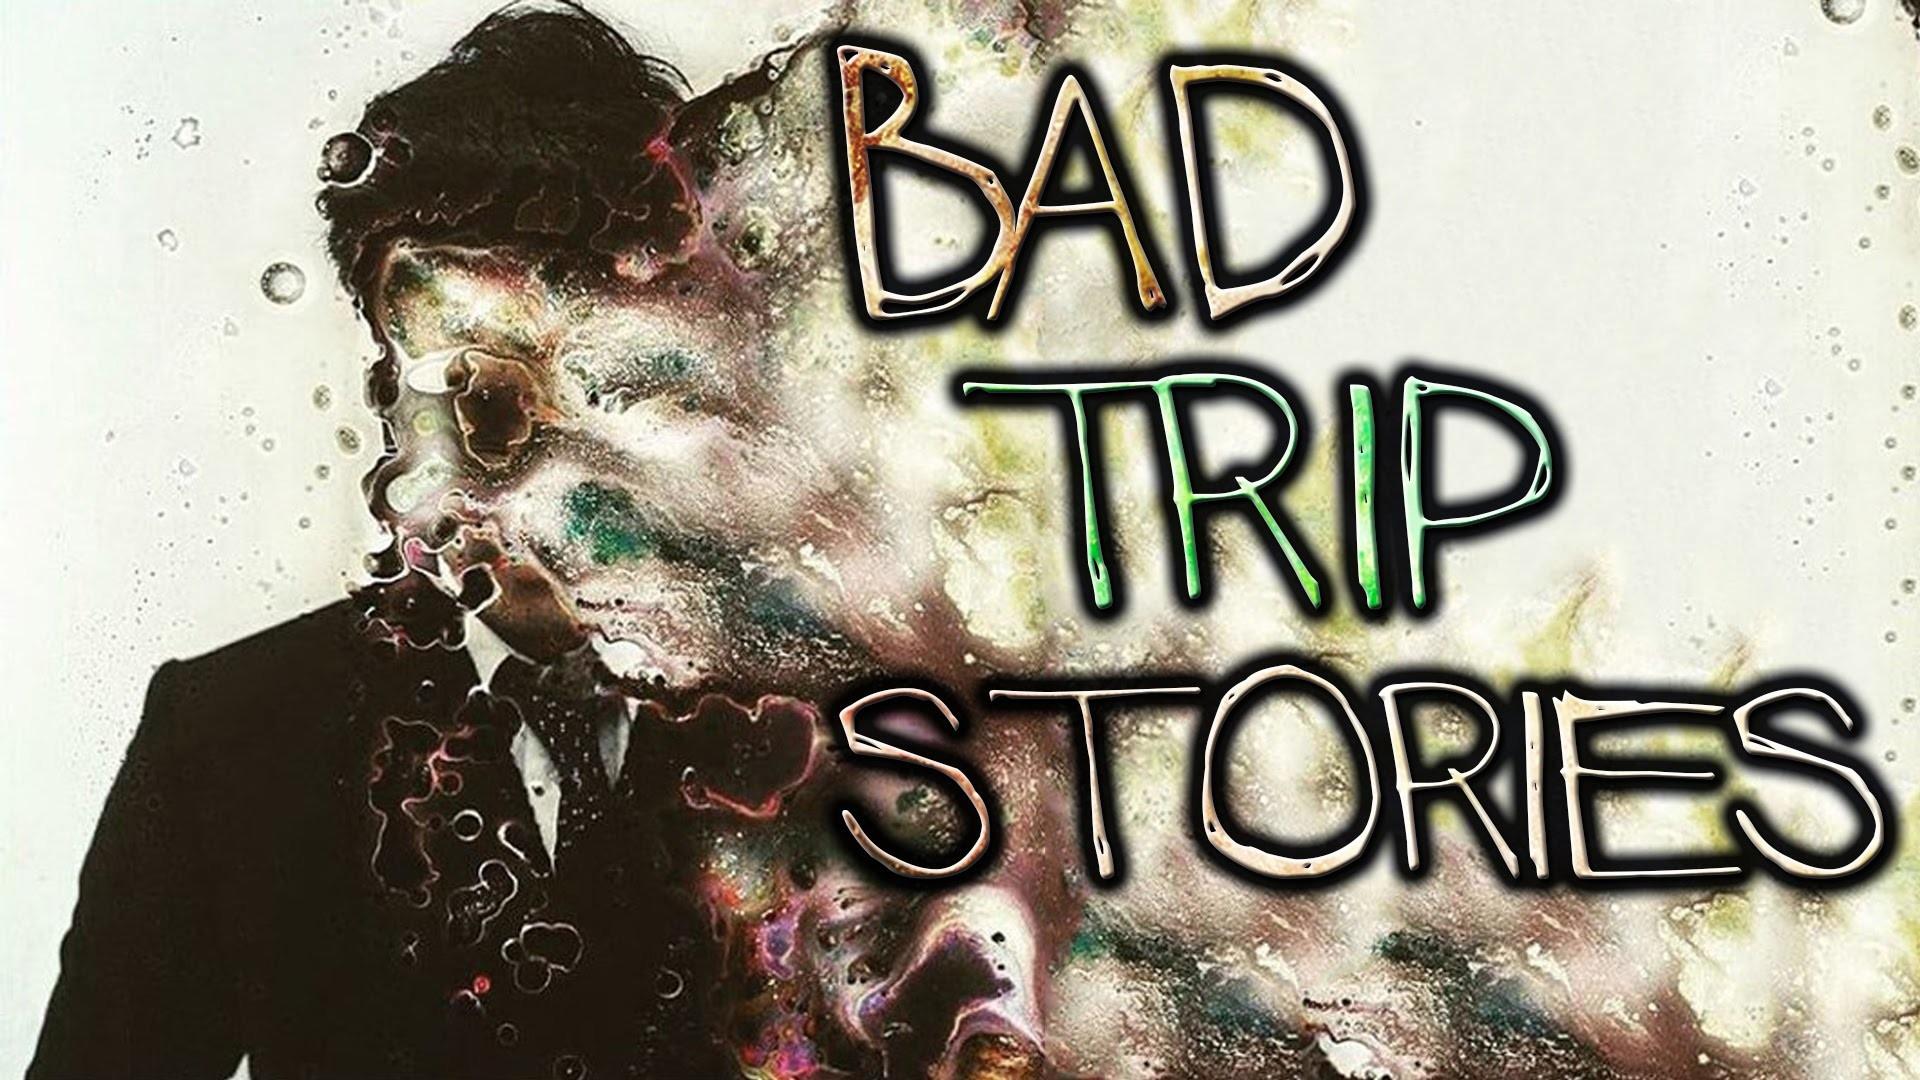 3 TRUE Bad Trip Stories [Acid // LSD]